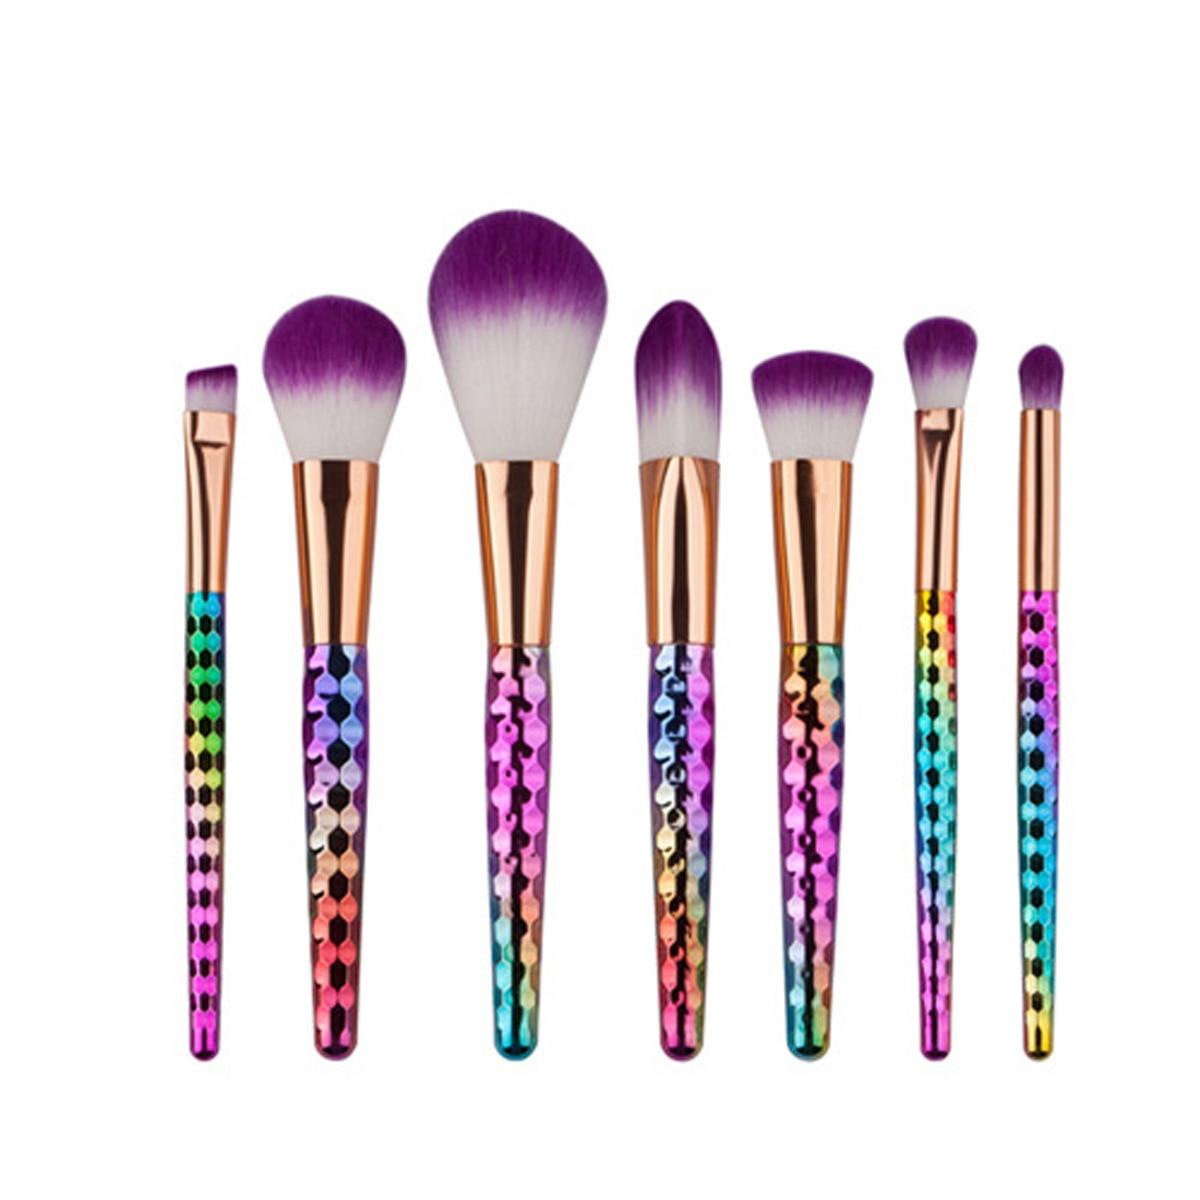 цена на Honeycomb Rainbow Handle Makeup Brushes Set Purple Hair Eyshadow Blusher Brush Powder Contour Beauty Kit Tools 4/5/6/8/9/10 Pcs